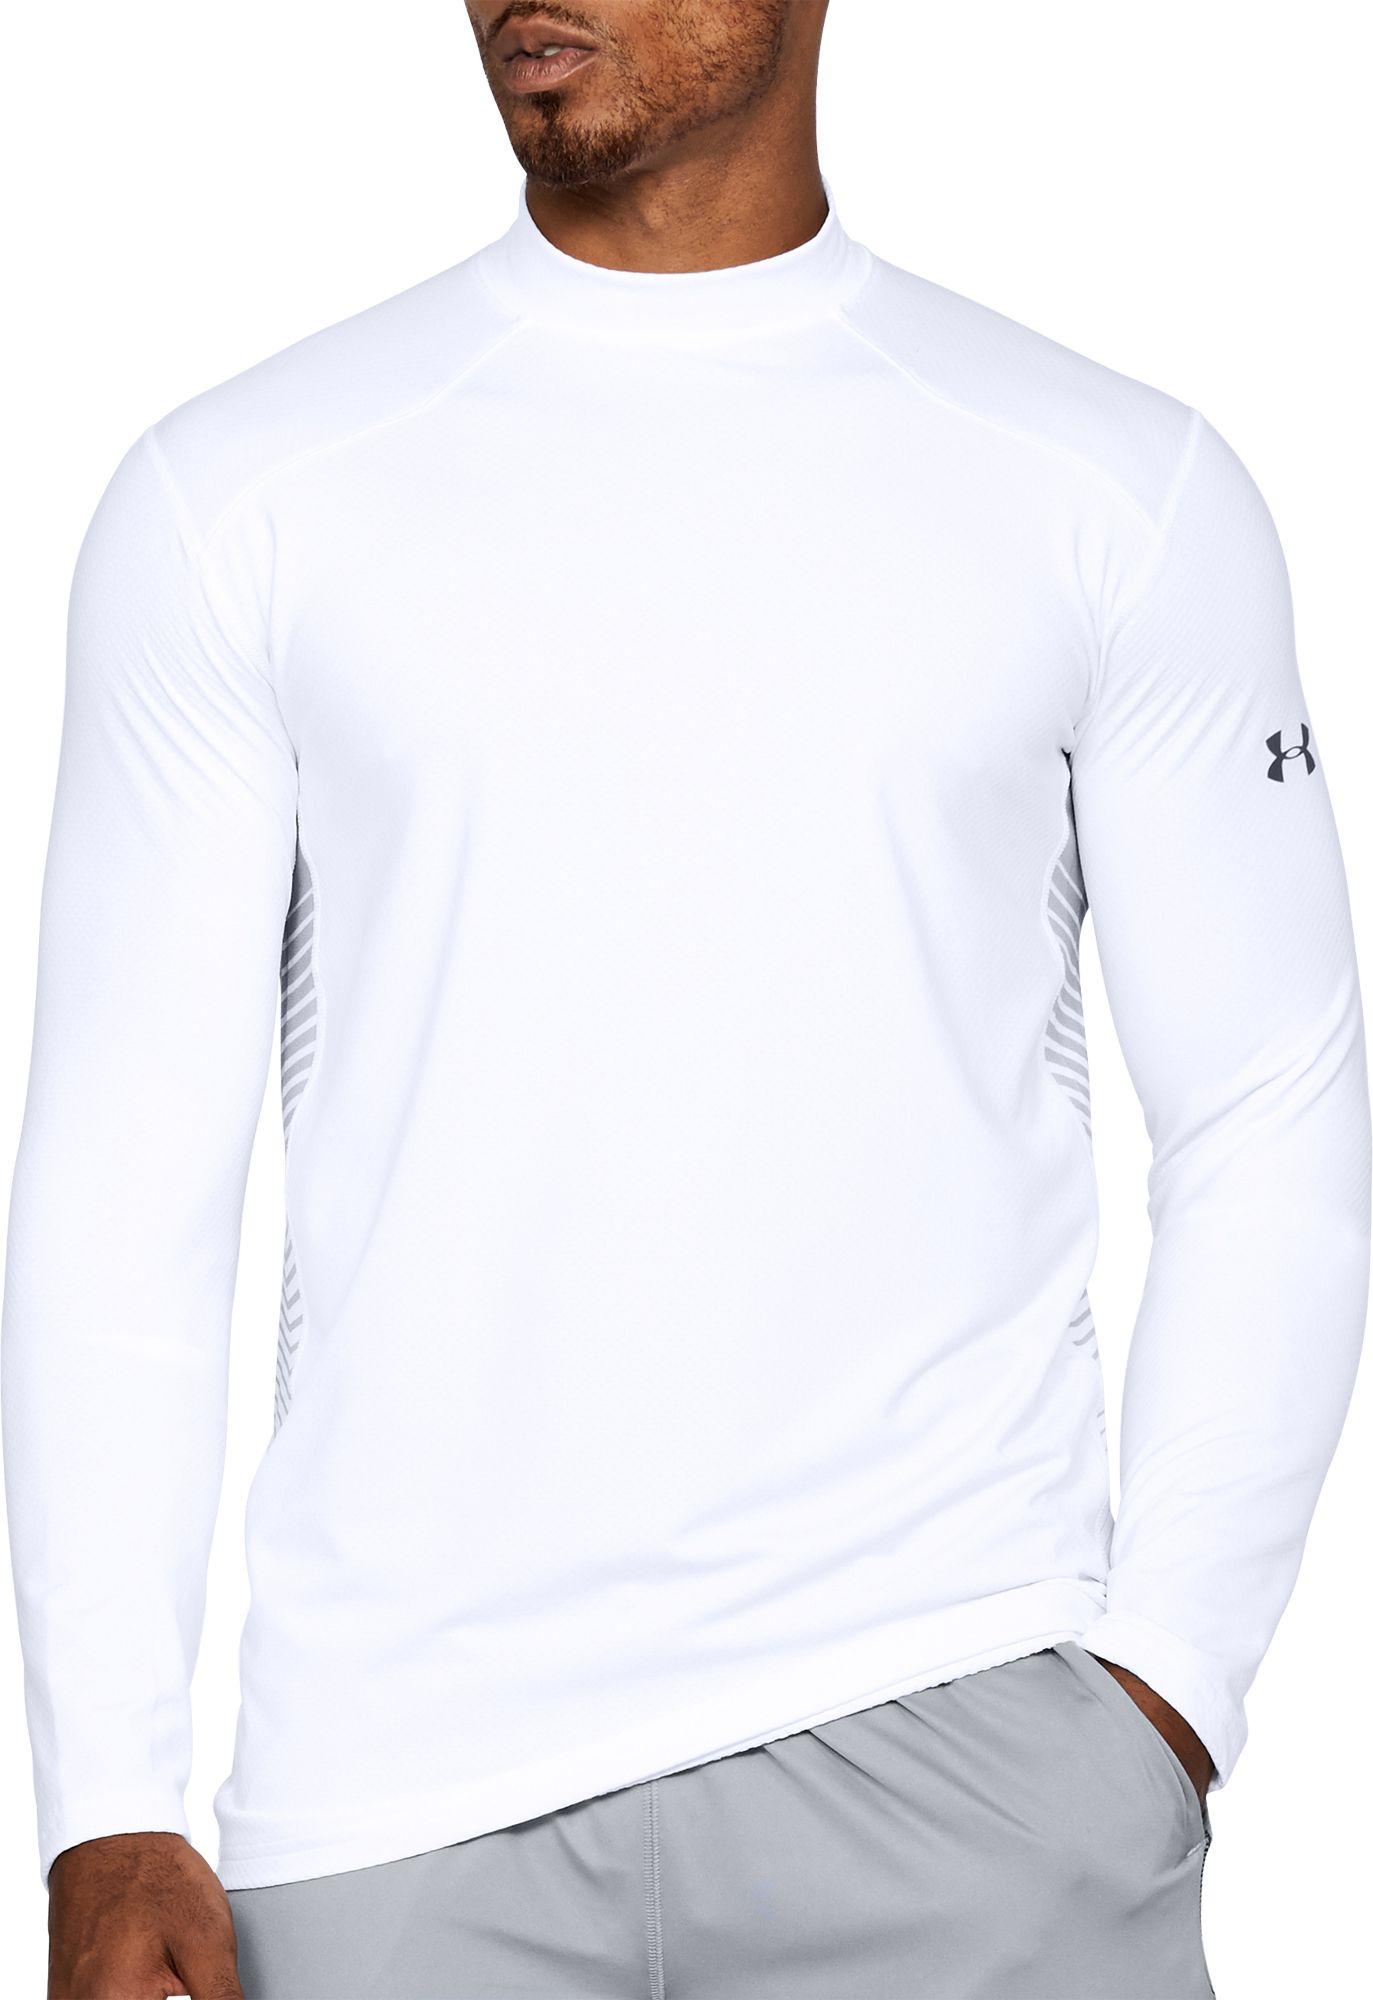 Under Armour Men's ColdGear Reactor Fitted Long Sleeve T-Shirt ...